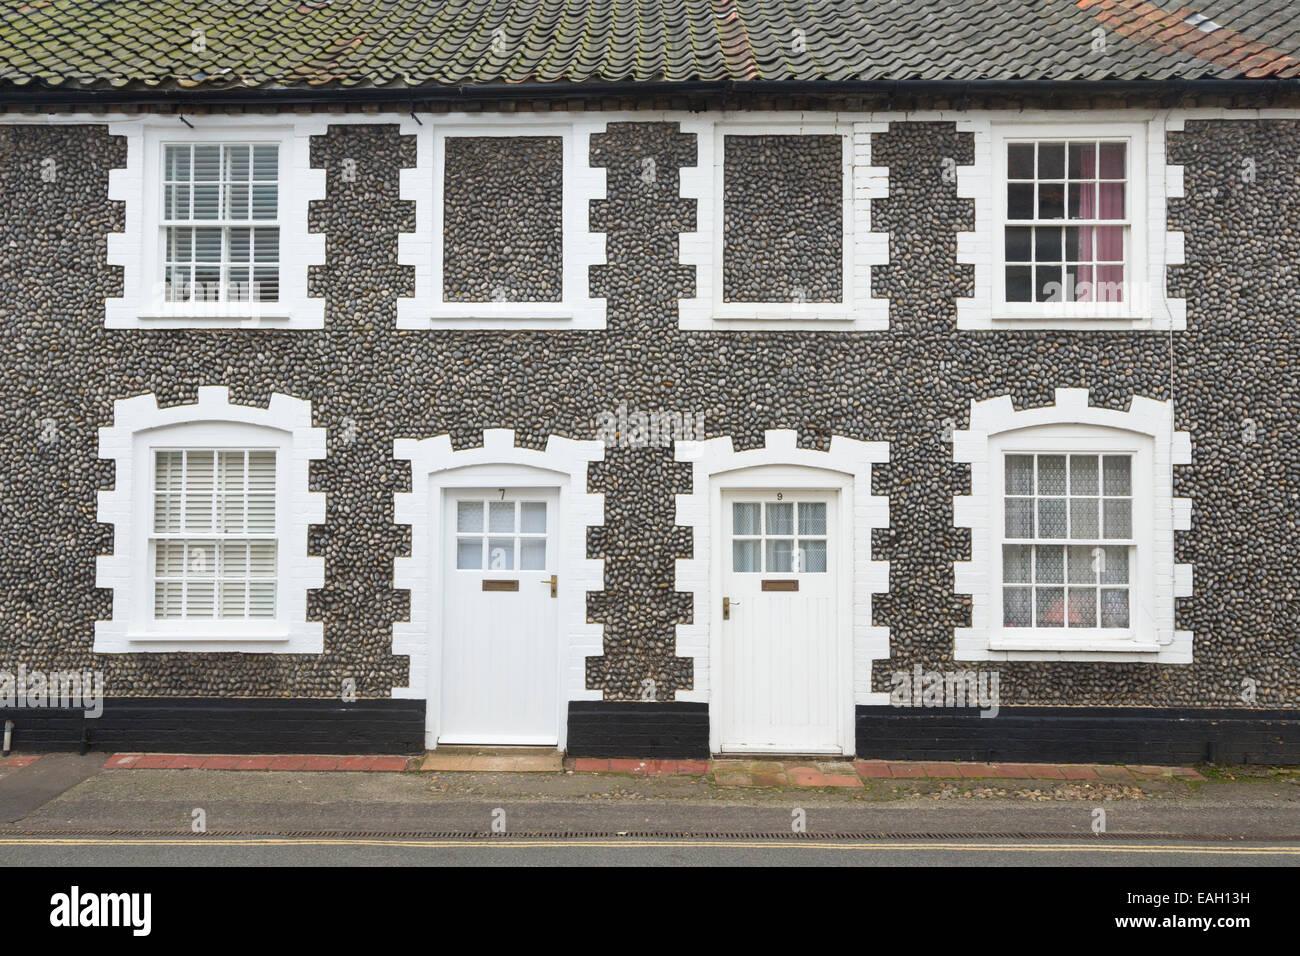 Terraced flint cottages, Albert Street, Holt, Norfolk - Stock Image